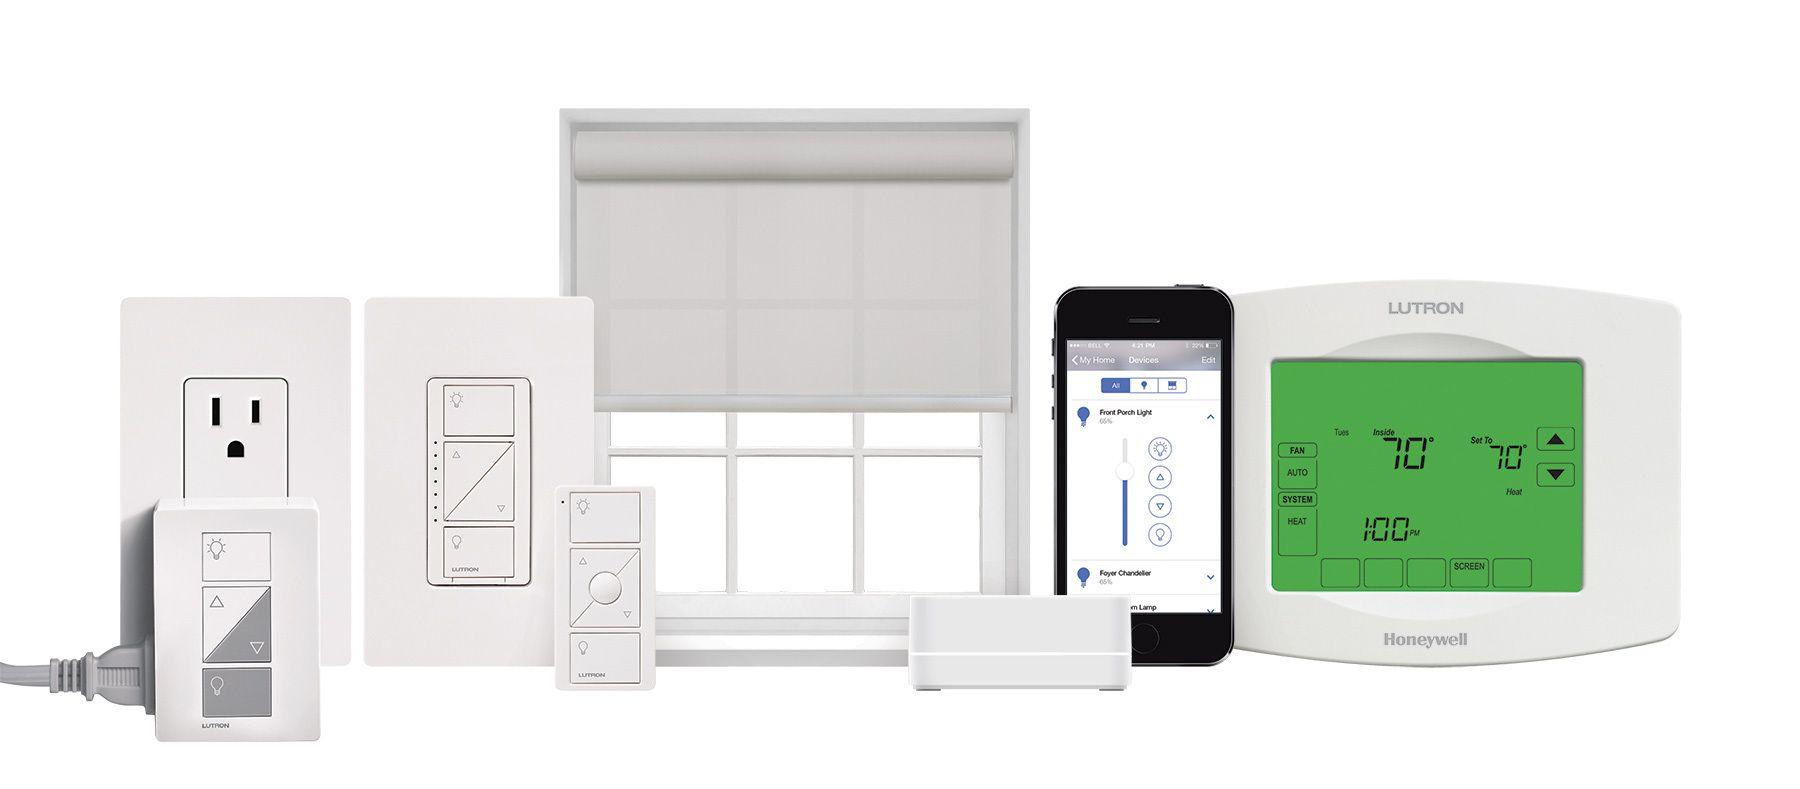 Lutron Serena And Sivoia Qs Triathlon Shades Now Compatible With Its Apple Homekit Enabled Caseta Wireless Smart Bridge Lutron Kit Homes Lighting Controls